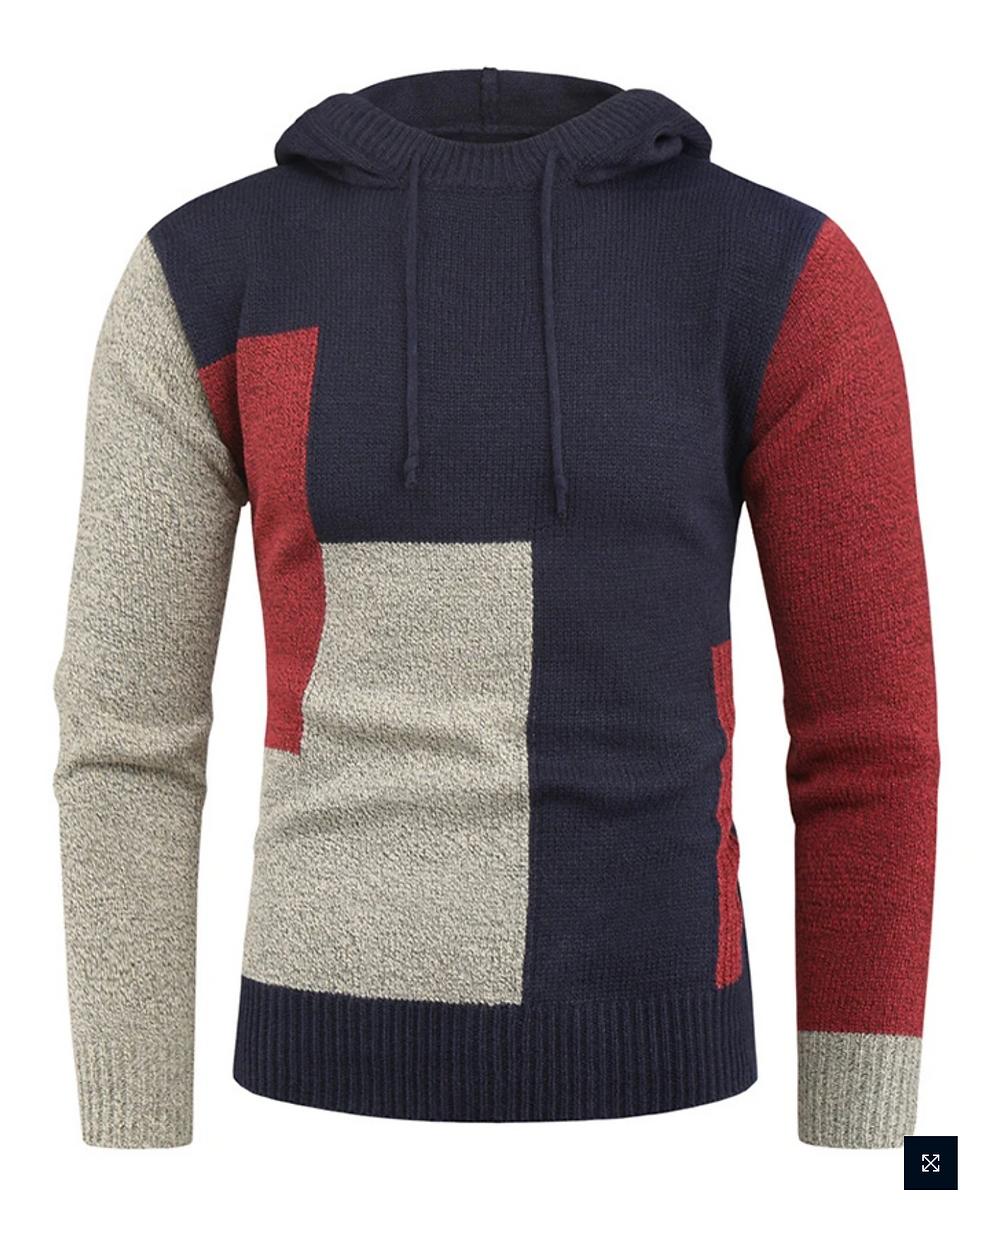 Sweater Sweatshirt from LovelyErica